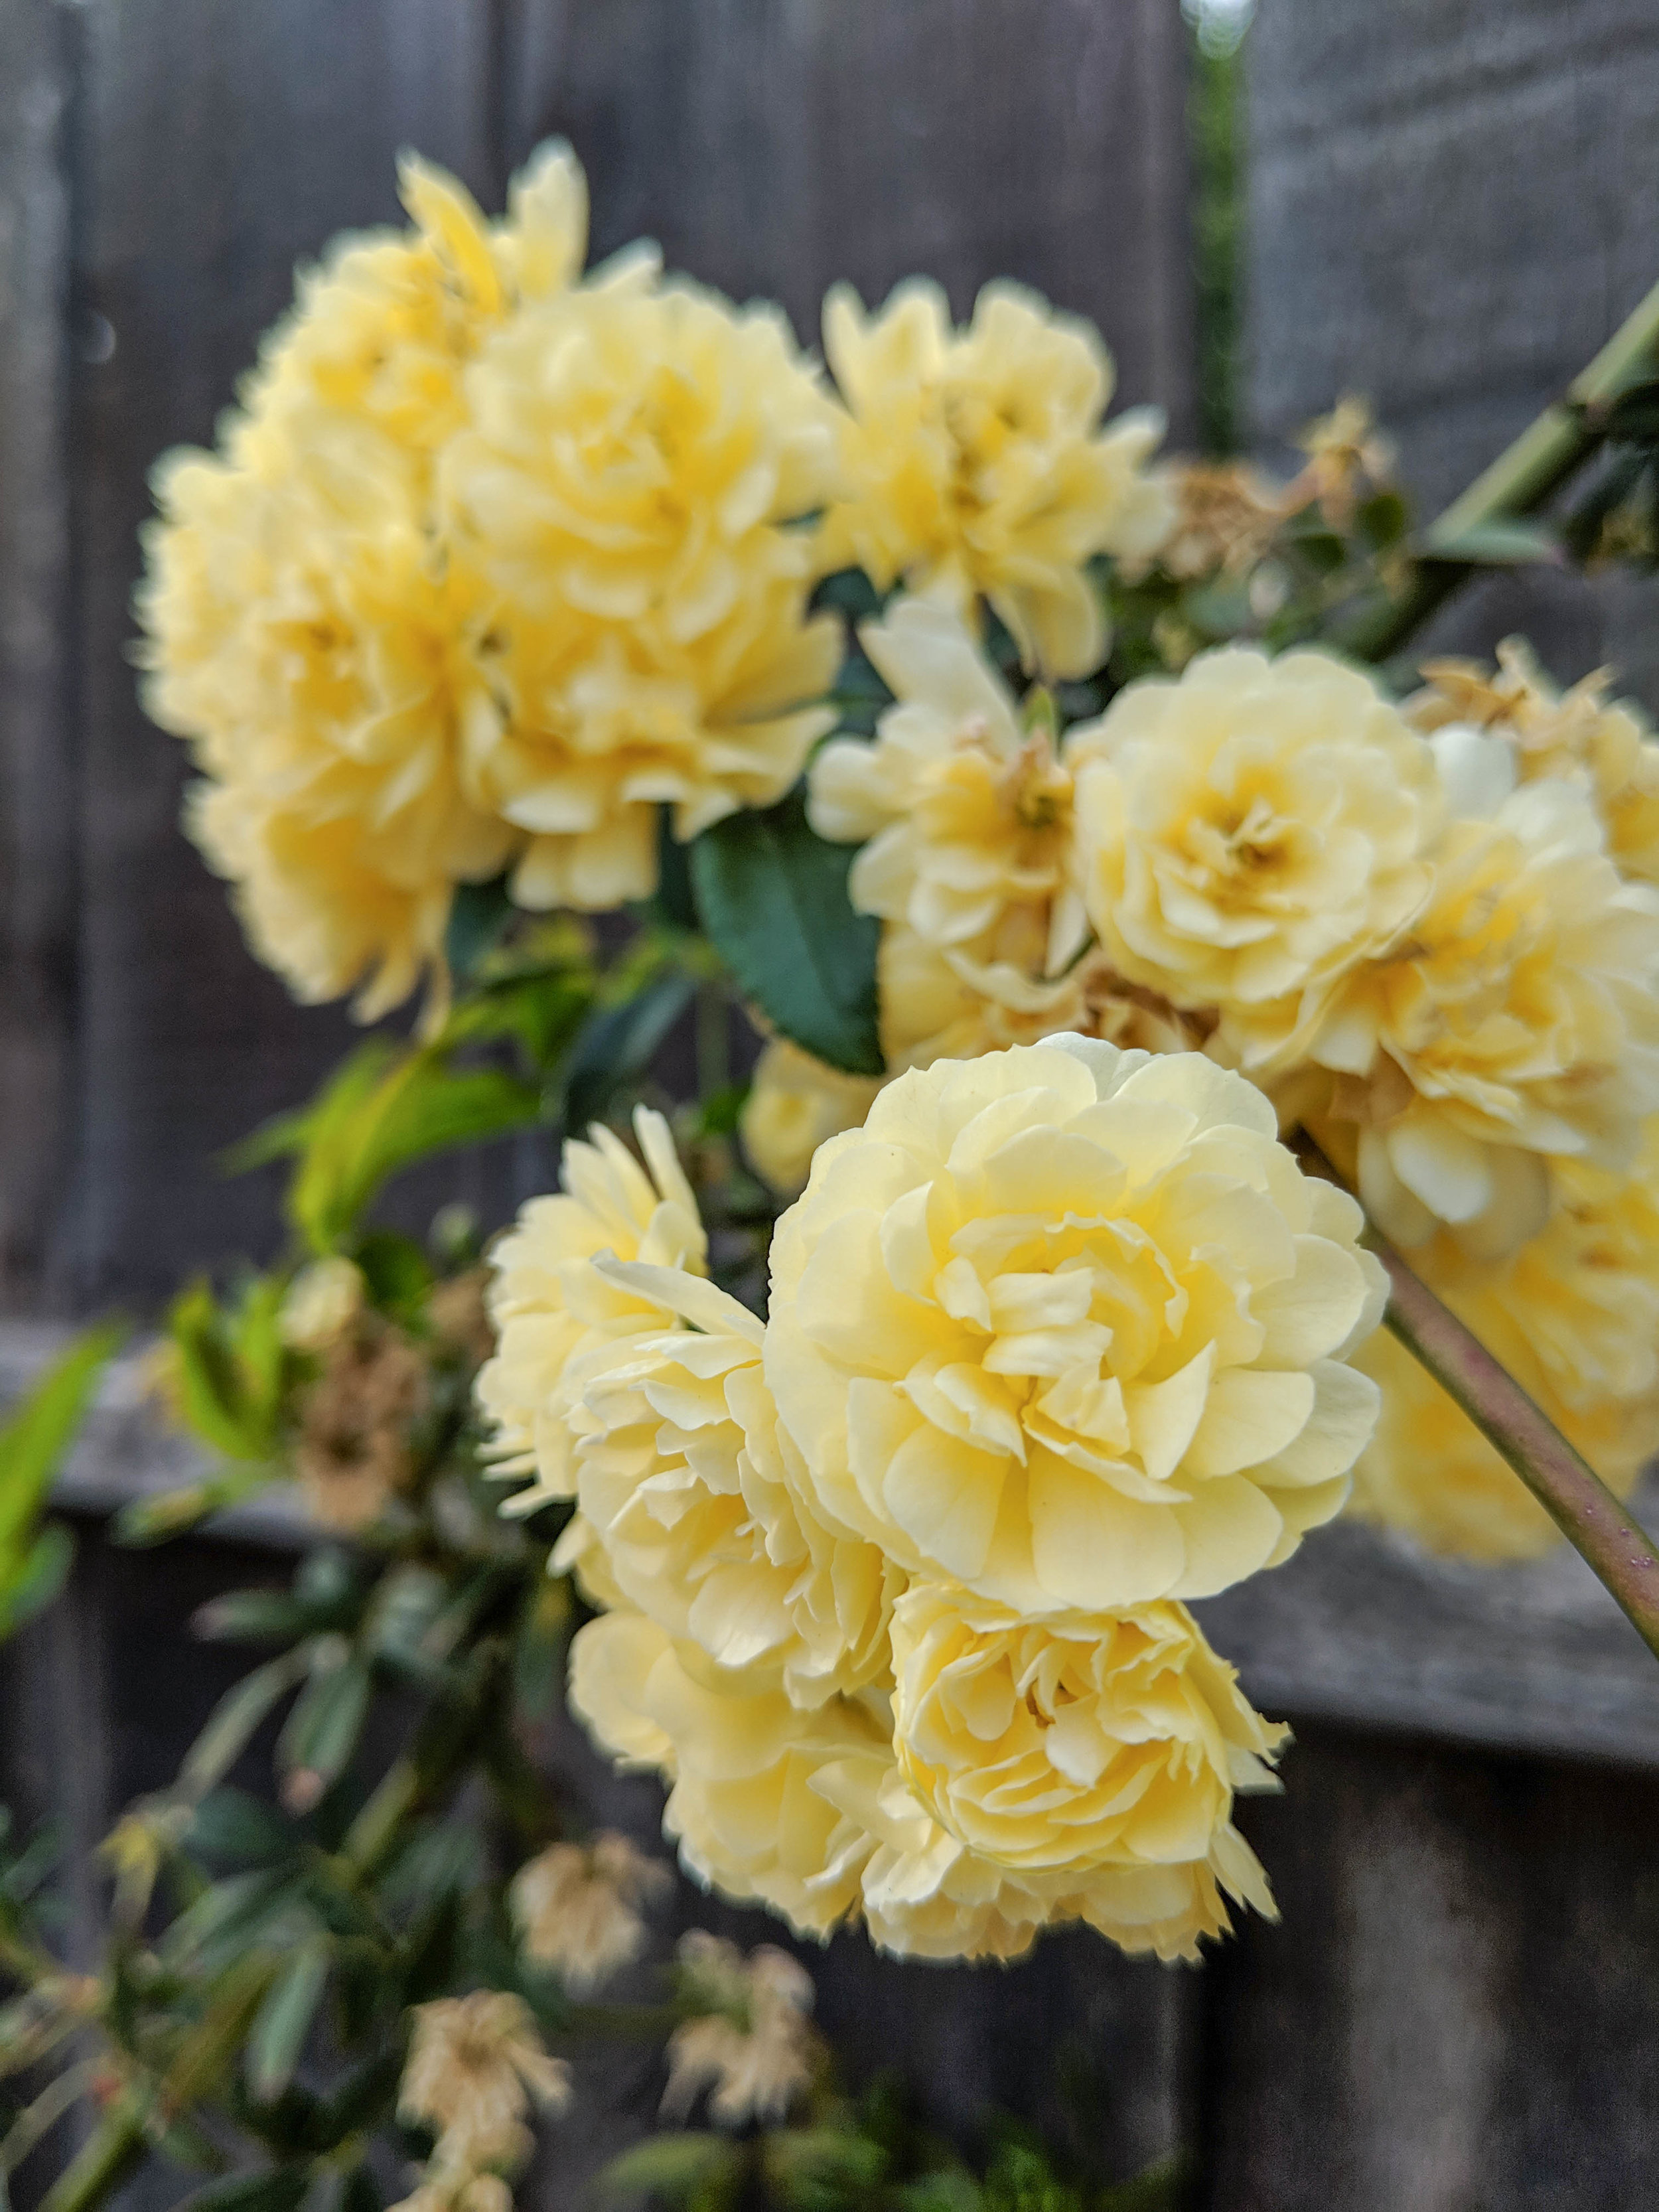 bri rinehart; photography; photography series; flowers; nature; spring